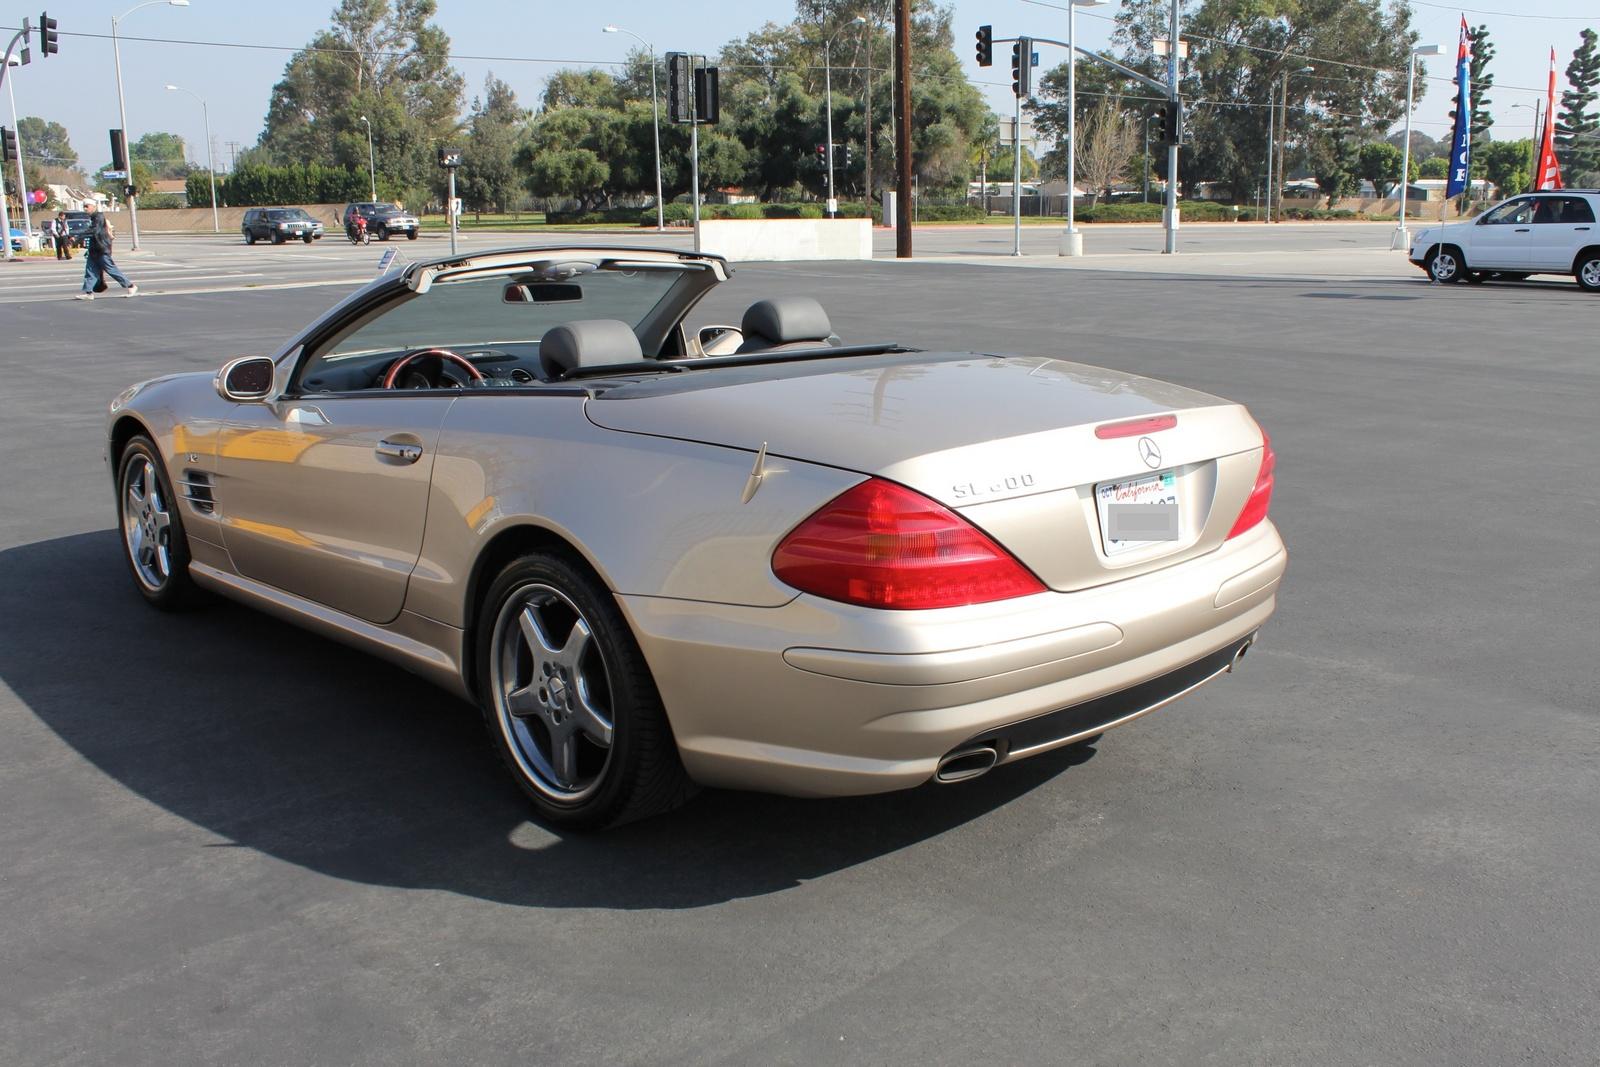 2003 mercedes benz sl class pictures cargurus for Mercedes benz sl 500 2003